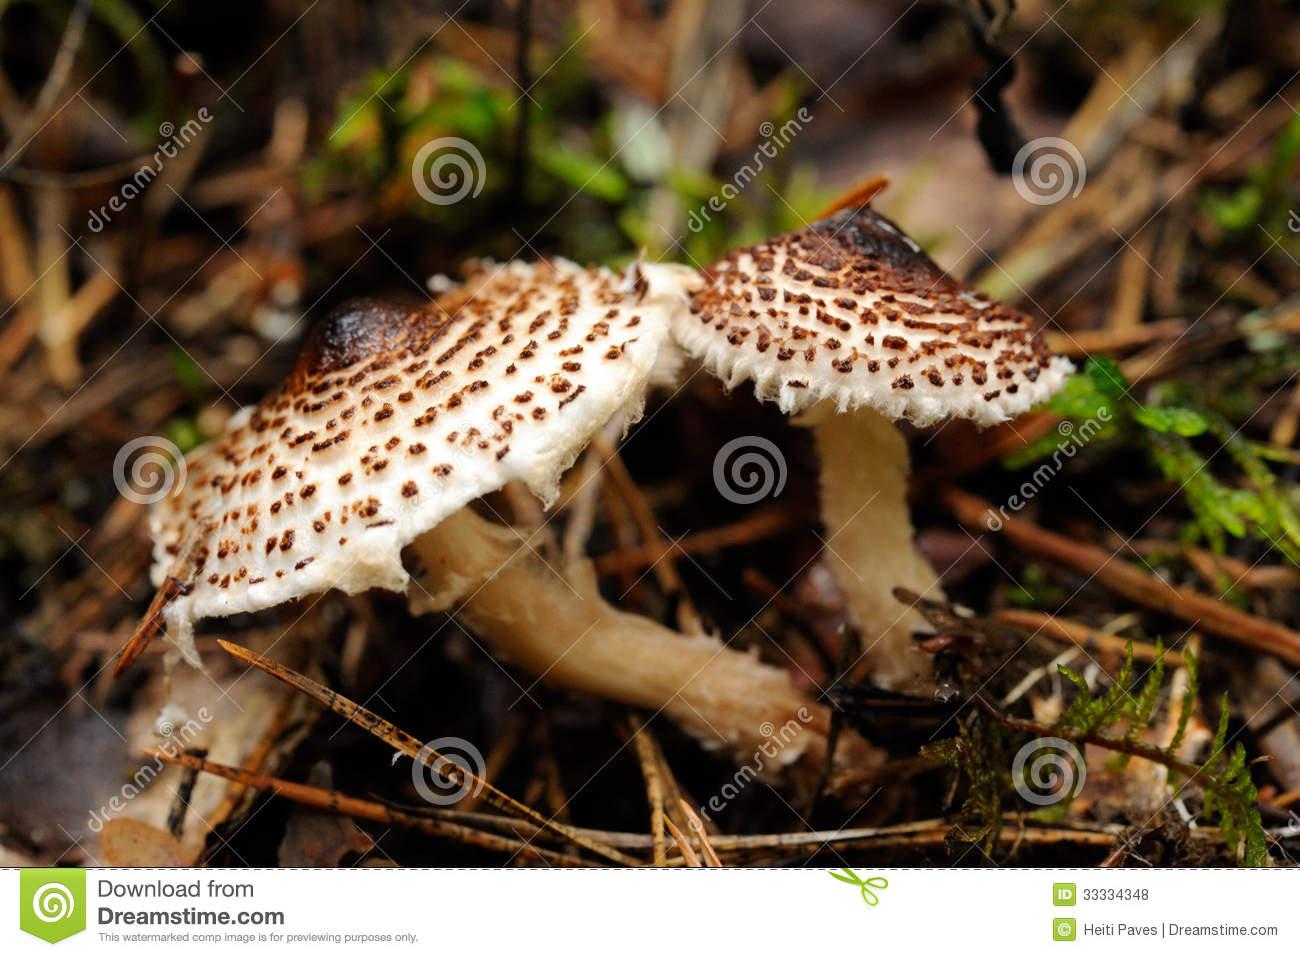 White Dapperling Mushroom In Grassland Stock Photo.